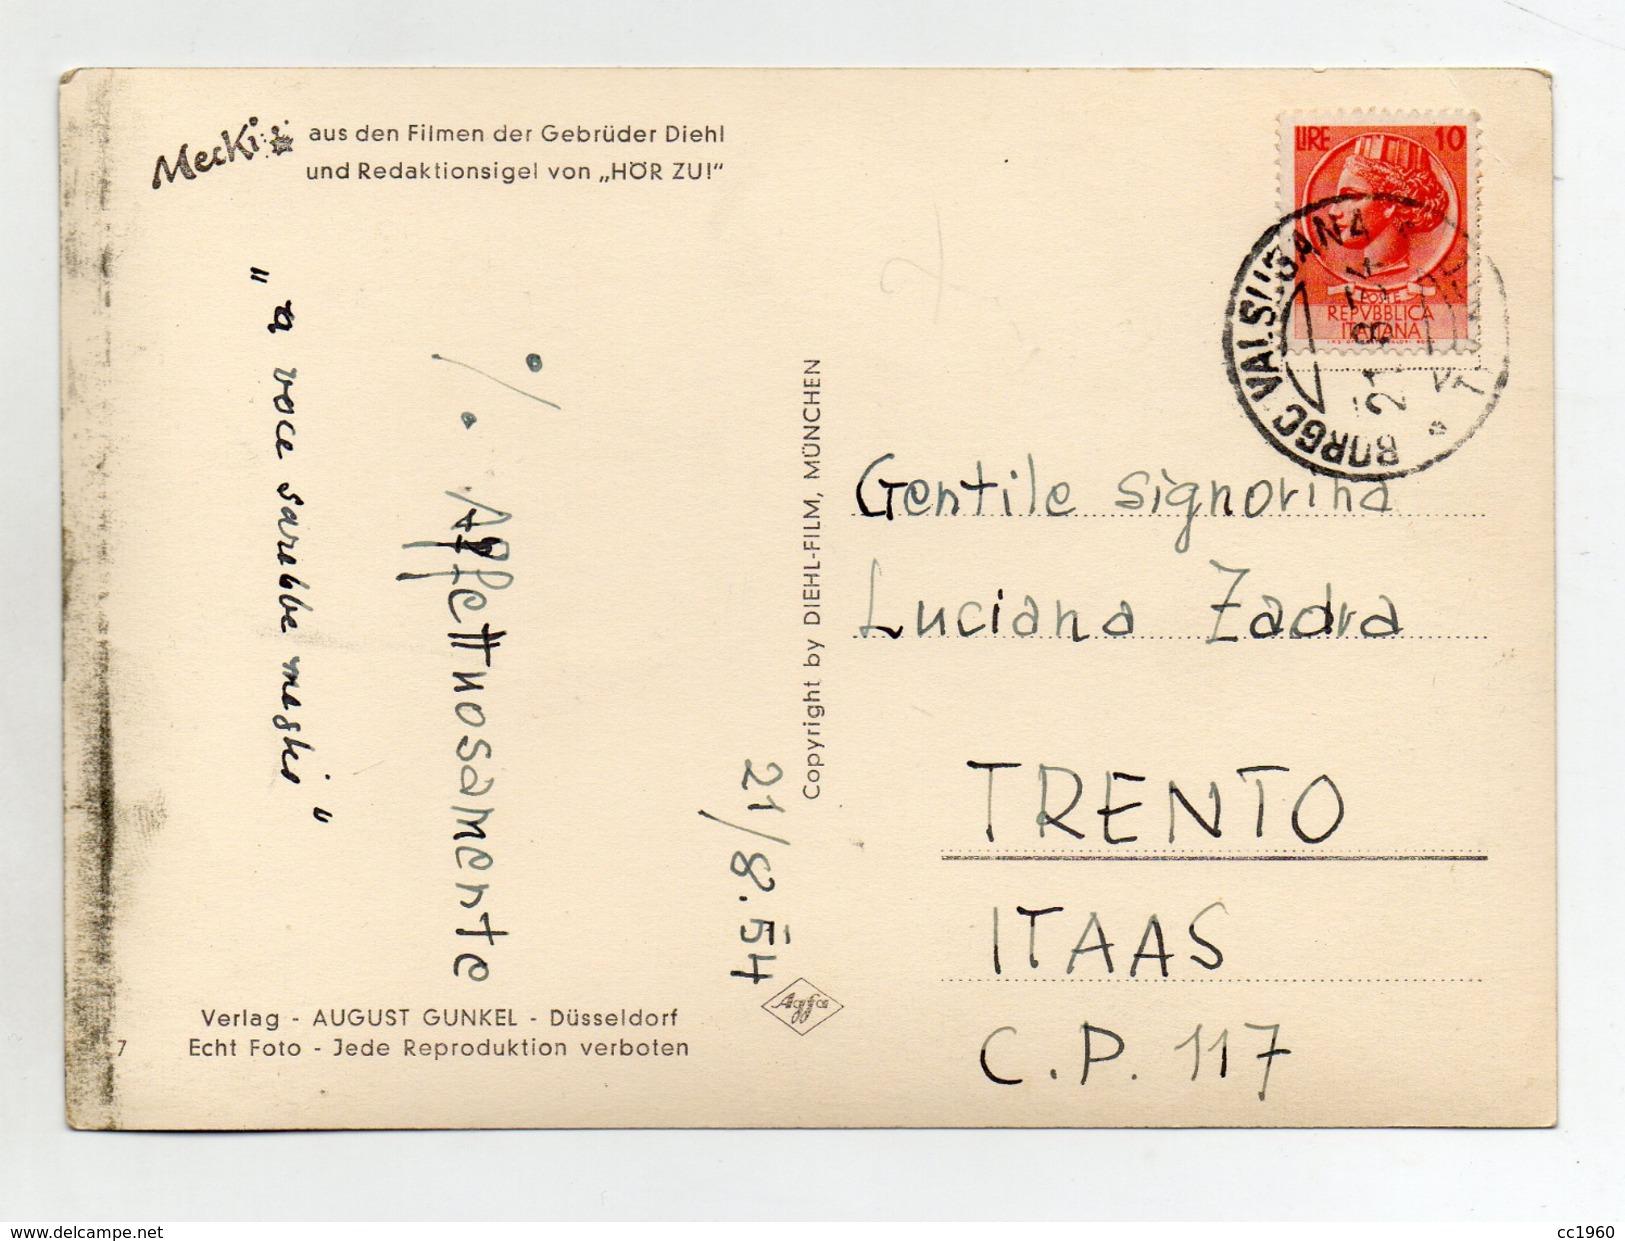 MECKI - Mundlich Ging Es Besser - Viaggiata Nel 1954 - (FDC3158) - Cartolina Nr. 7 - Mecki